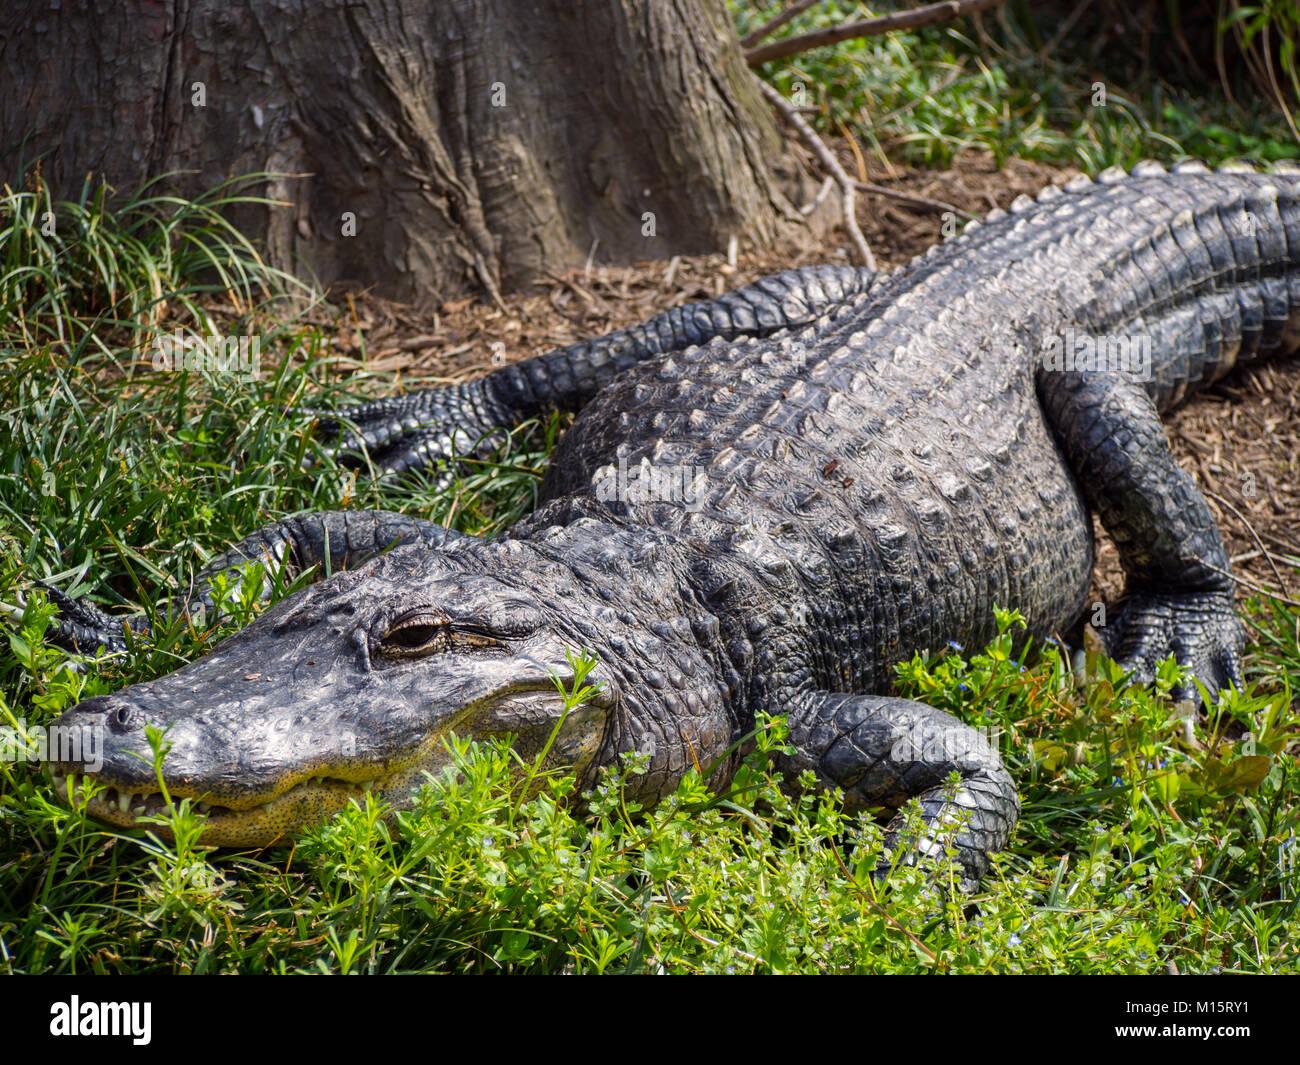 Alligator Laying on Ground, Zoo Animal - Stock Image